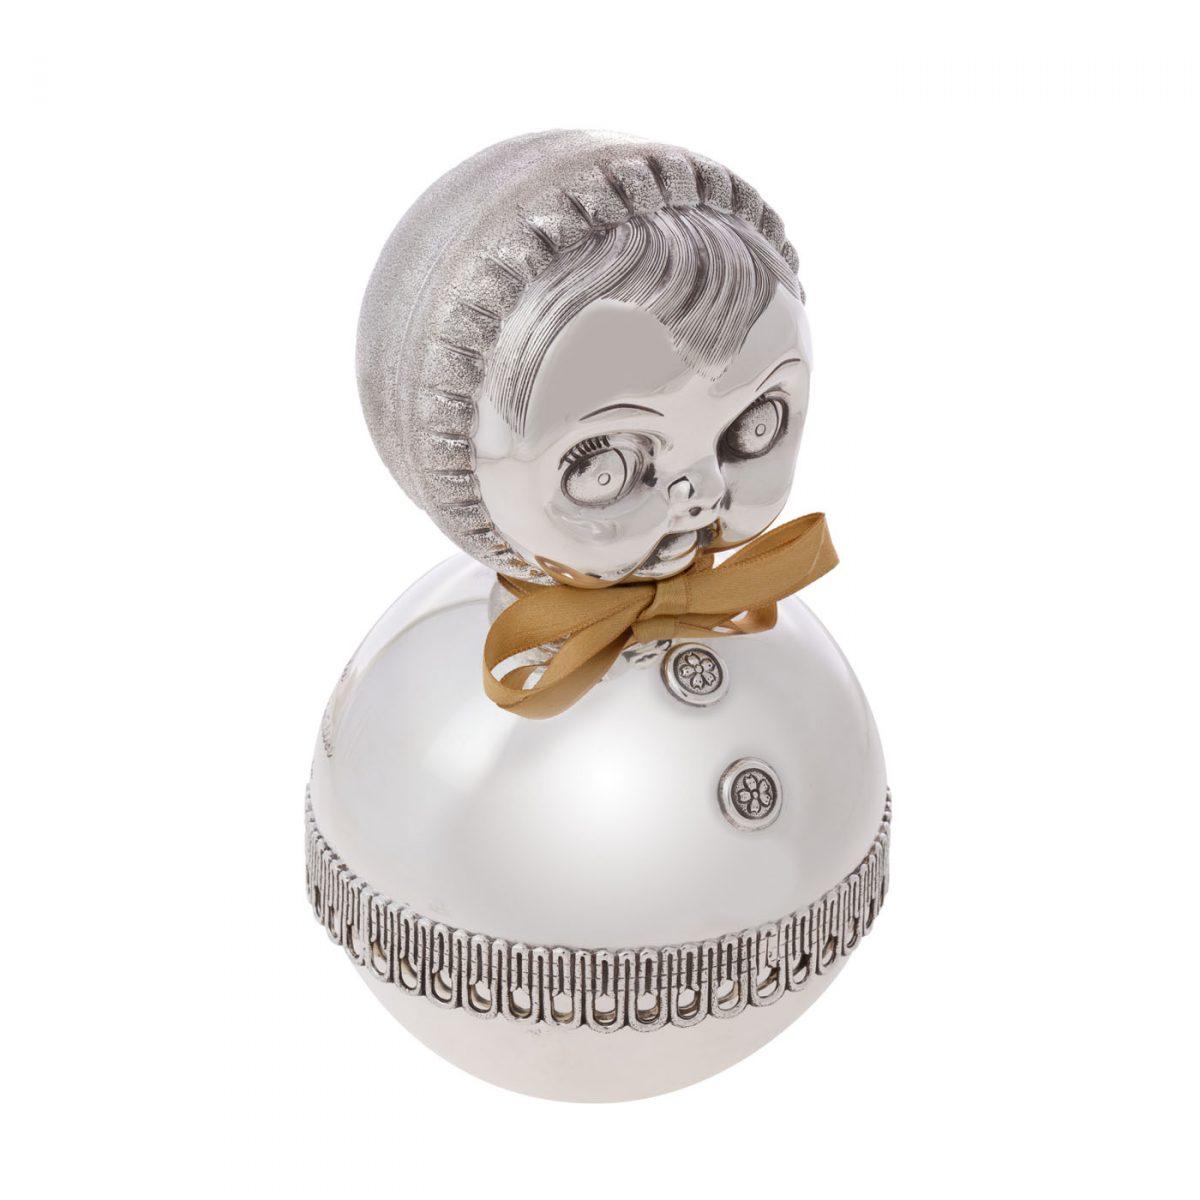 Missirizzi doll 1960s sterling silver